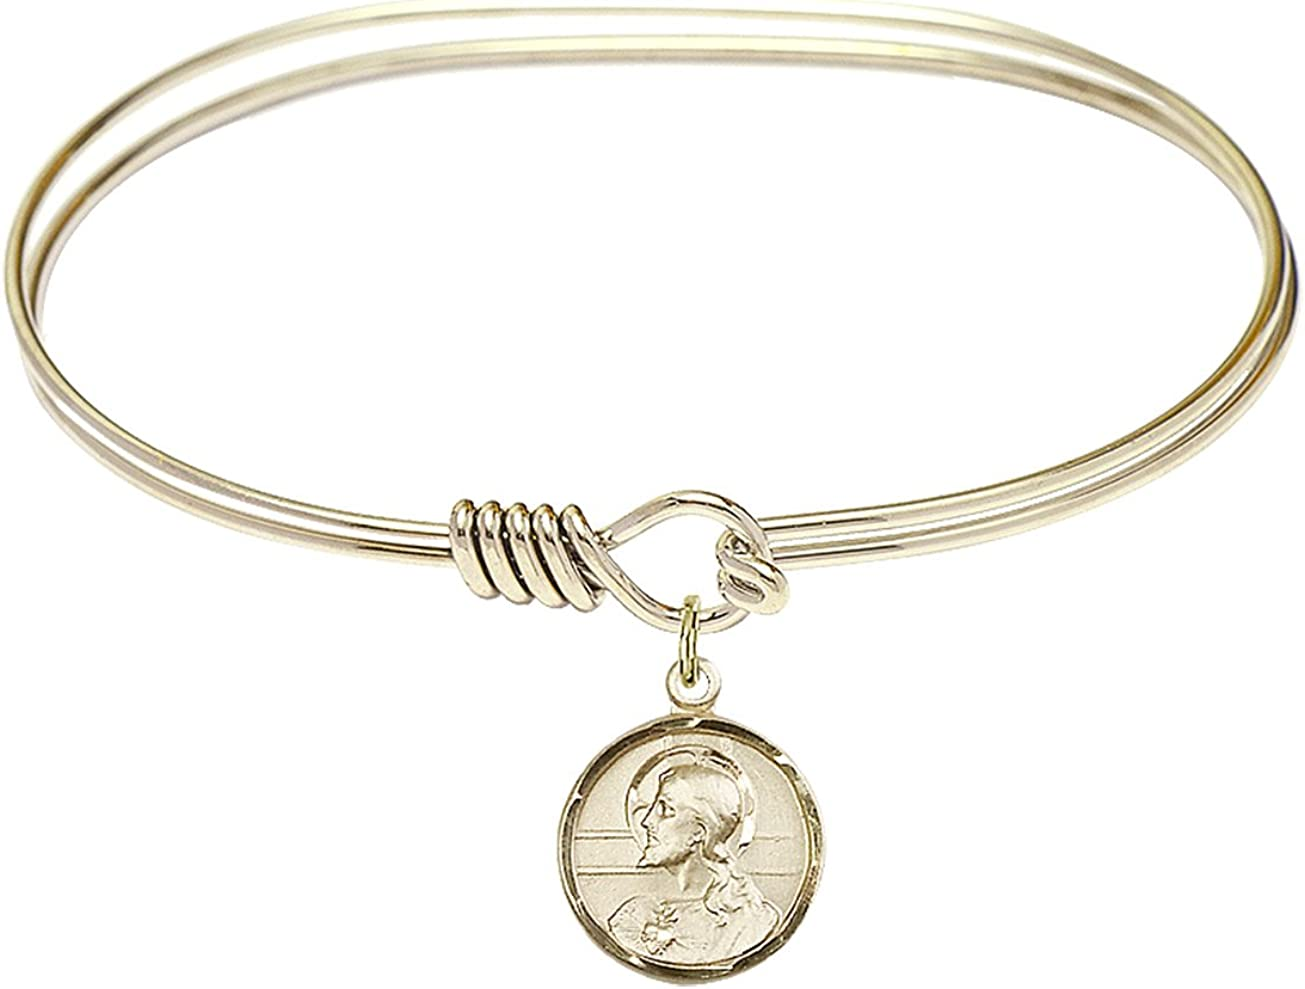 DiamondJewelryNY Eye Hook Be super welcome Bangle Bracelet with Charm. a Scapular Free Shipping Cheap Bargain Gift